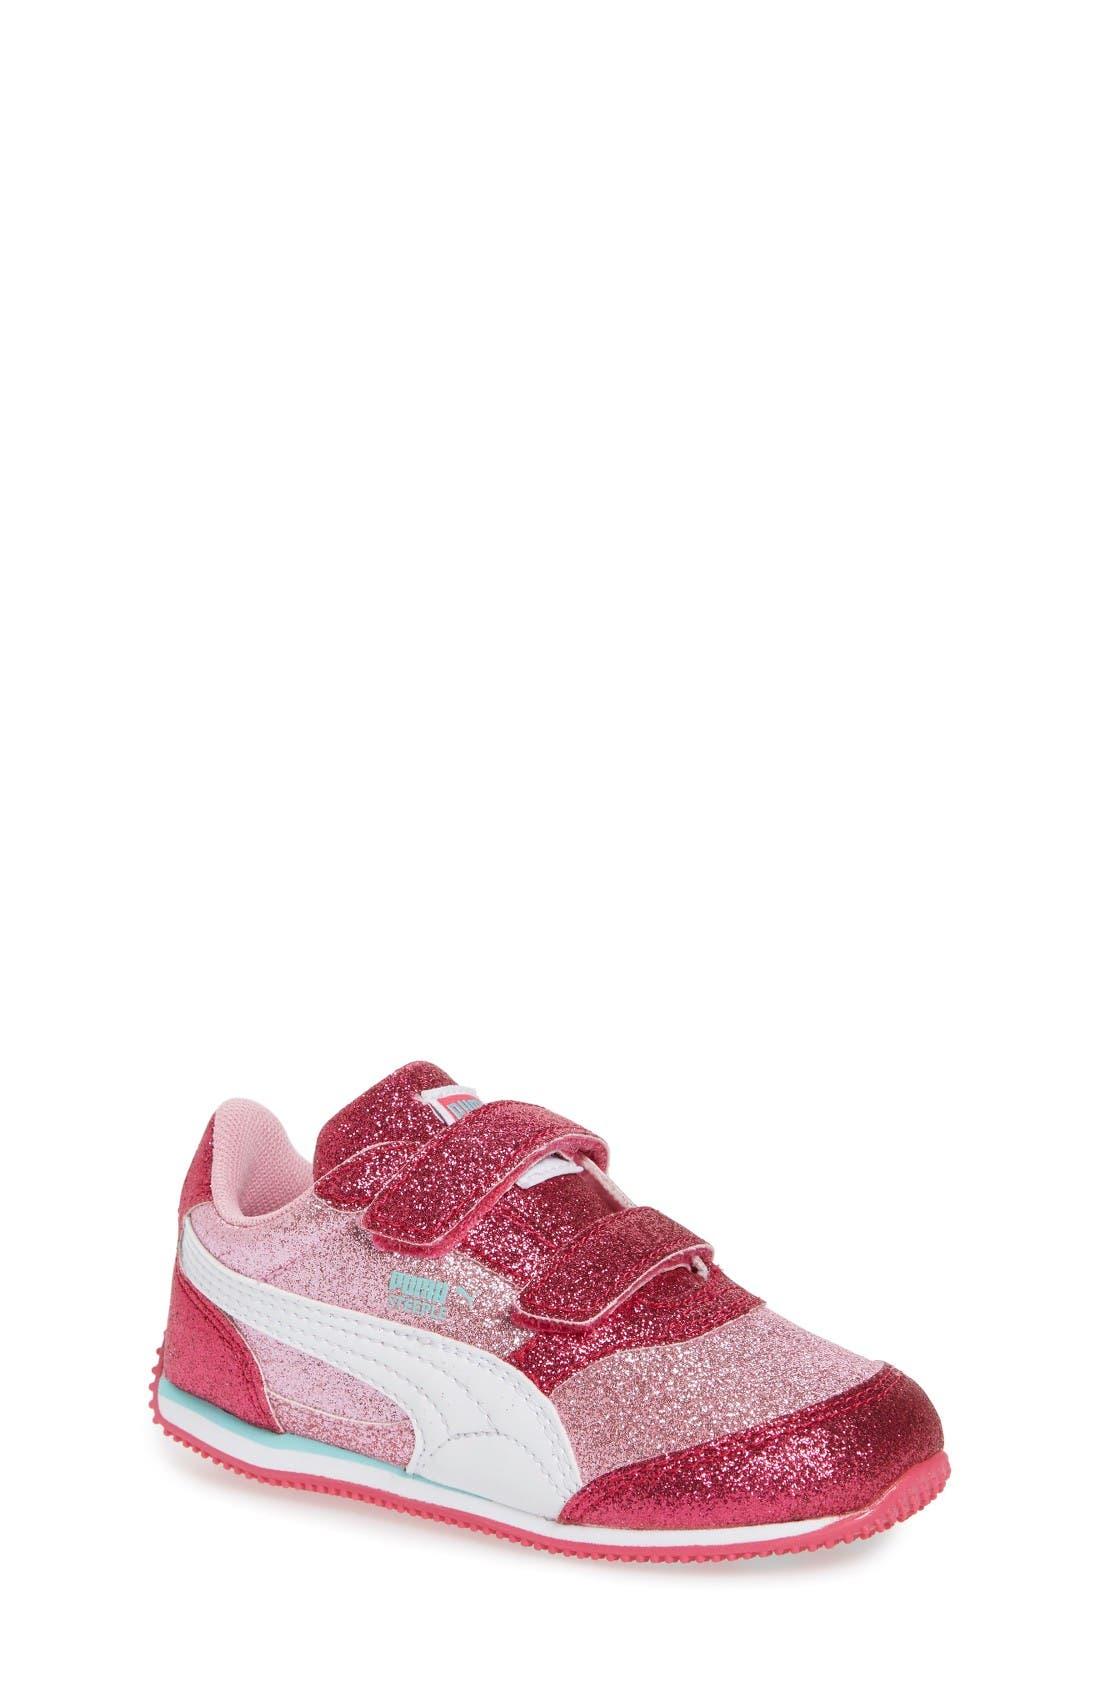 PUMA Steeple Glitz Glam Sneaker (Baby, Walker, Toddler, Little Kid & Big Kid)